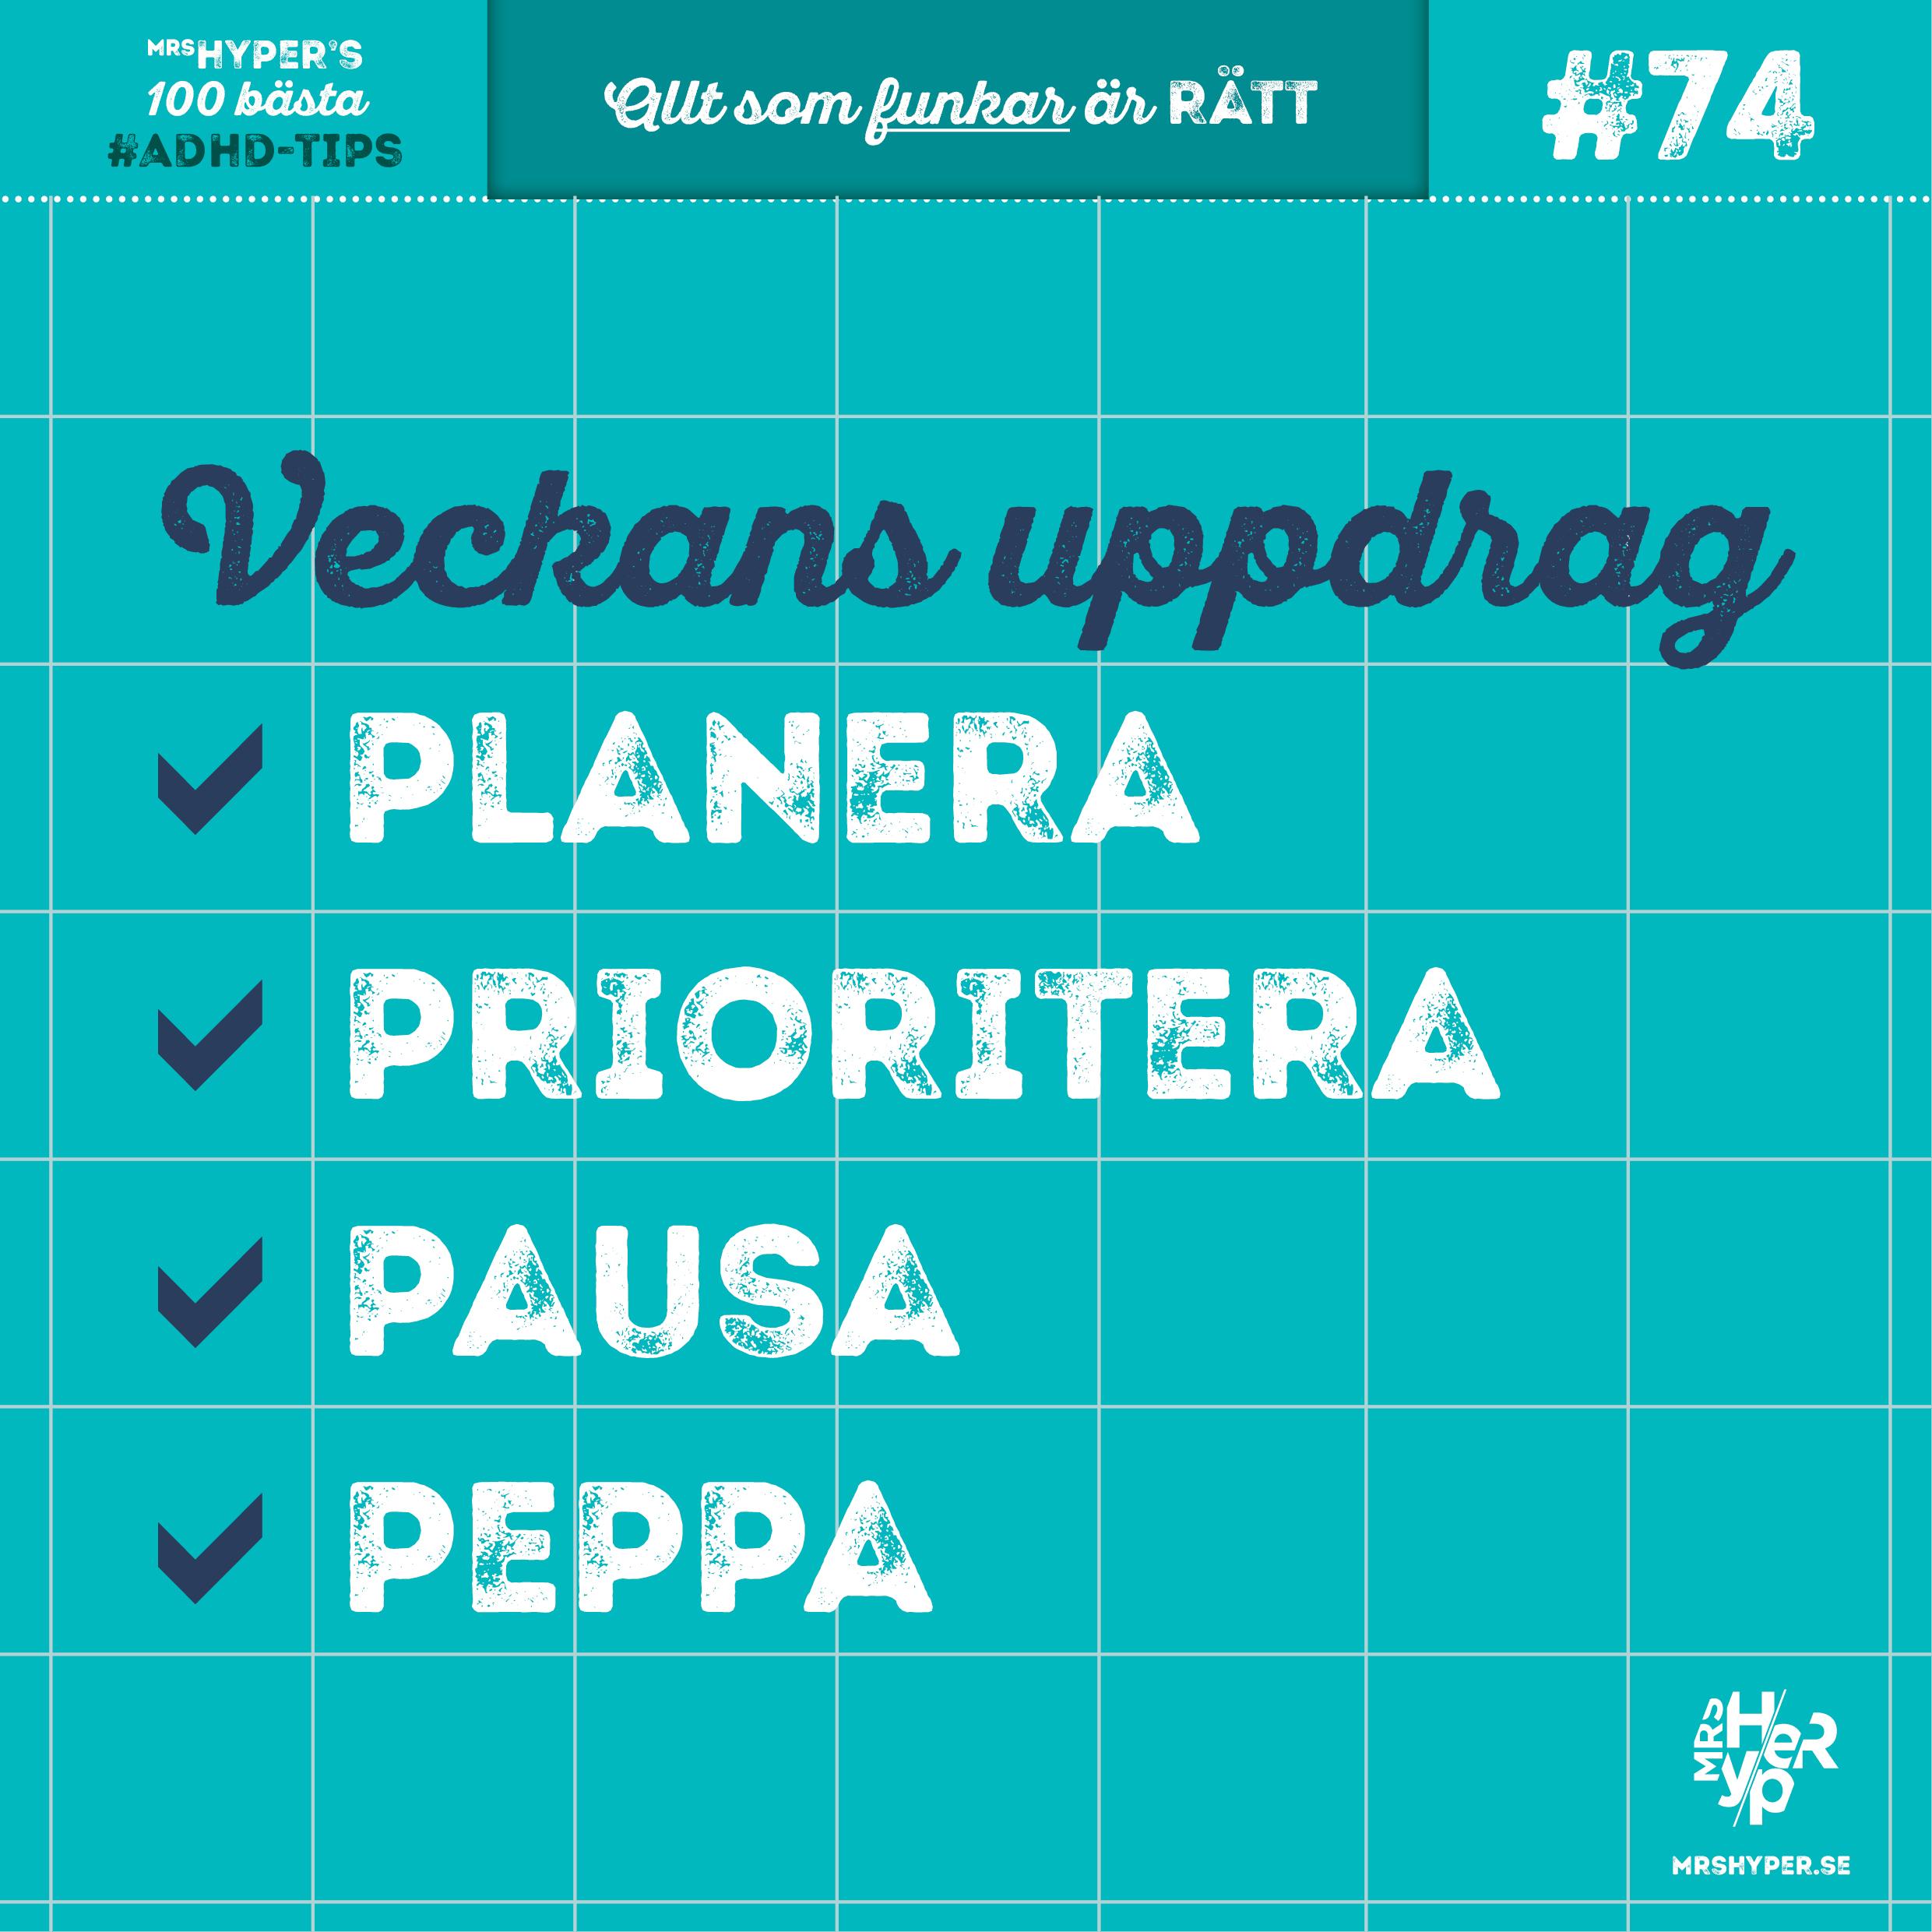 ADHD-tips #74. Planera Prioritera Pausa & Peppa